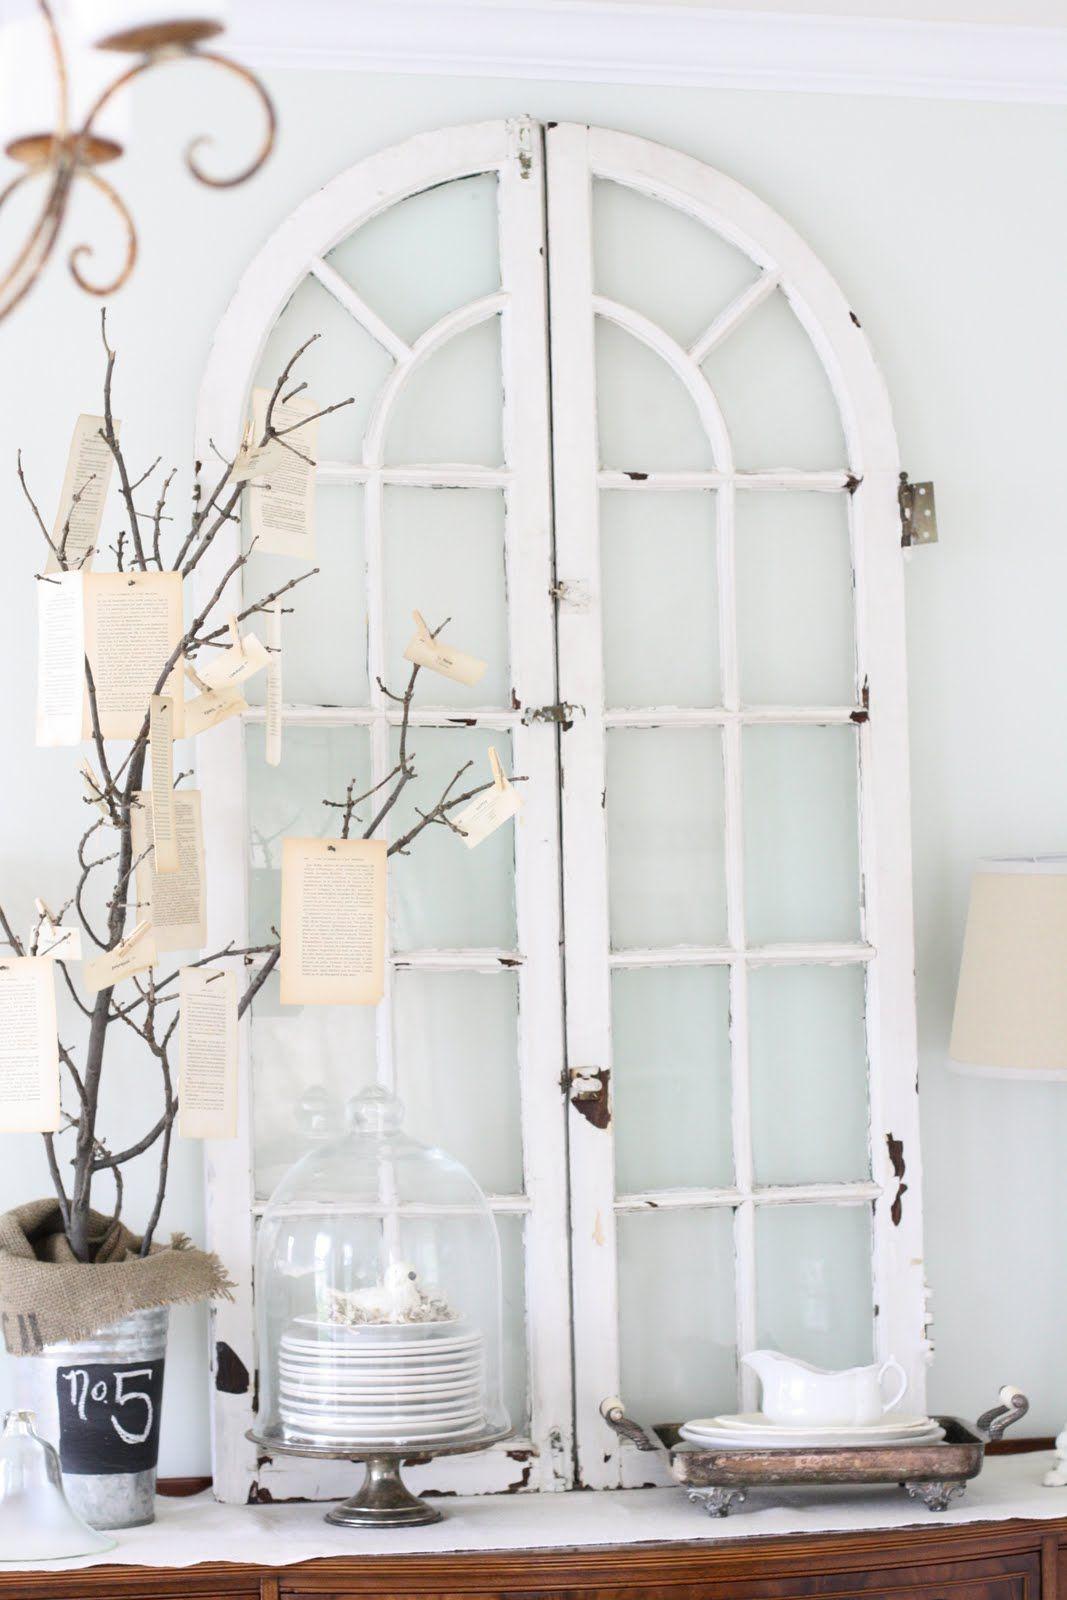 Window dressing ideas for arched windows  vintage window art  christmas decor  pinterest  window art